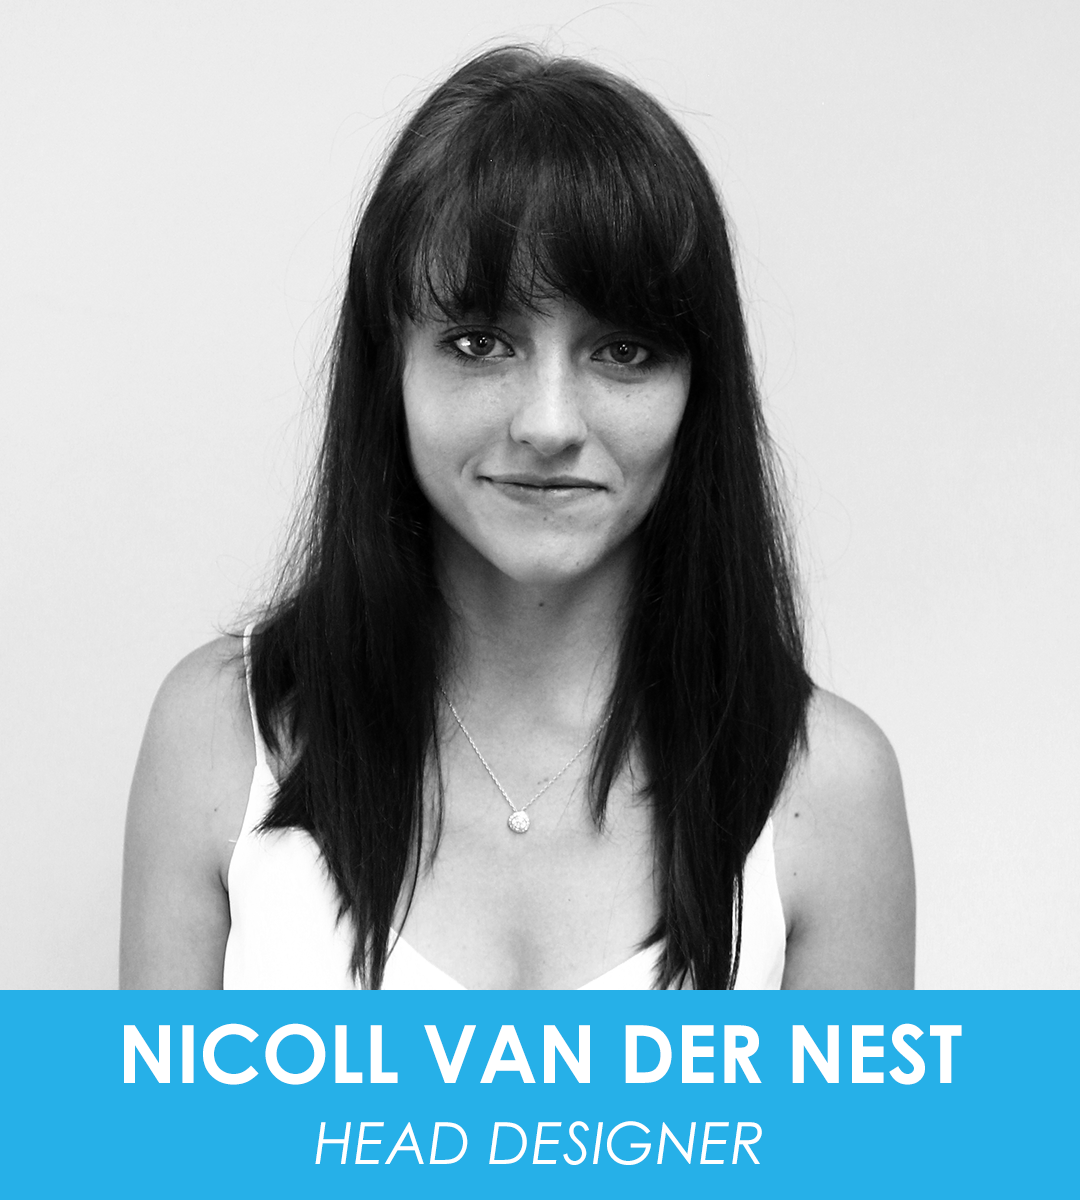 Image of Nicoll